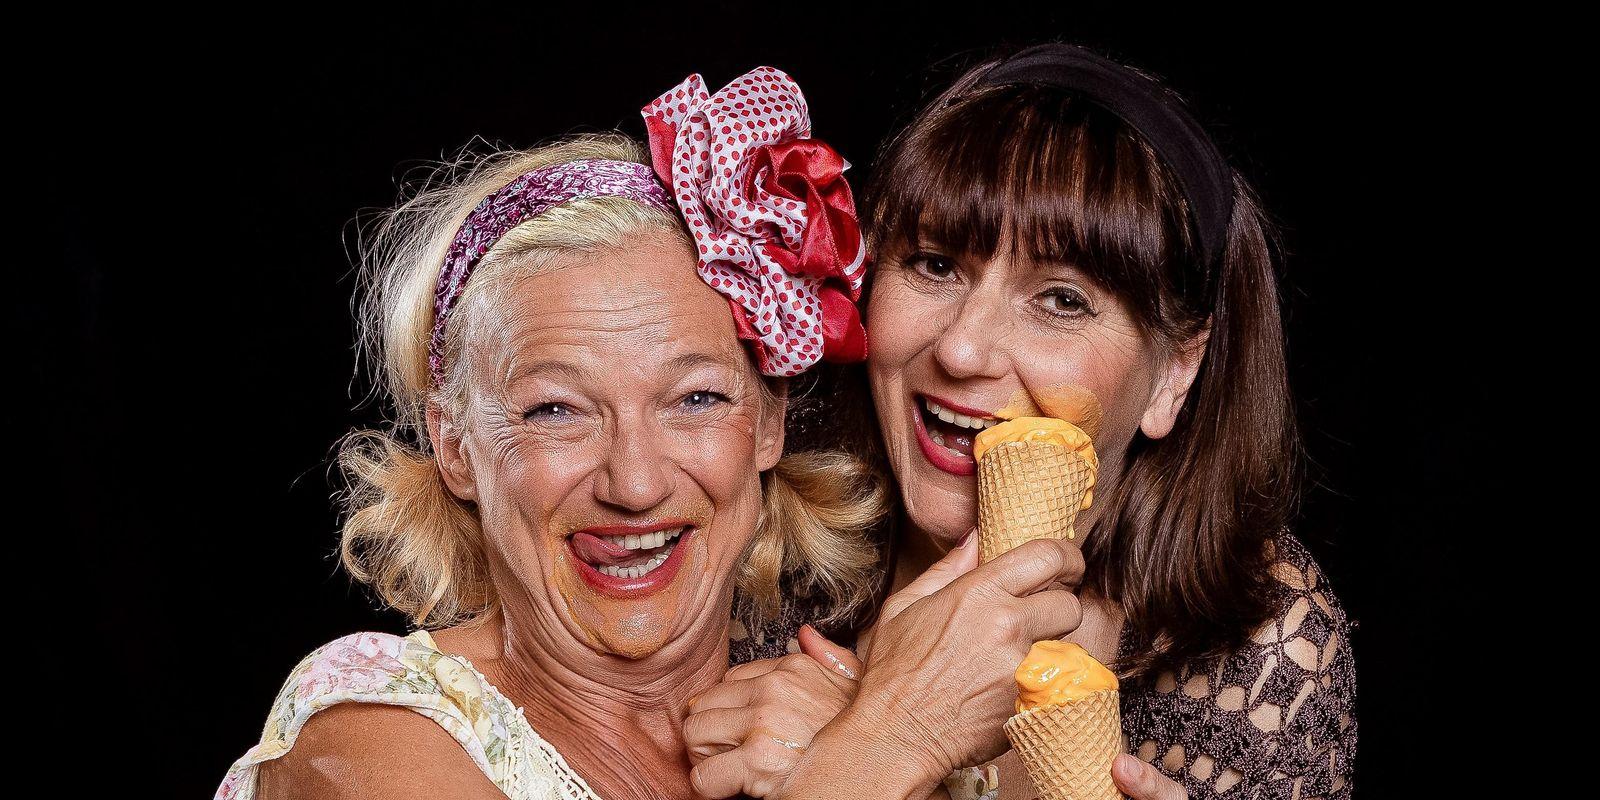 Eiscreme - Anita Köchl & Daniela Enzi